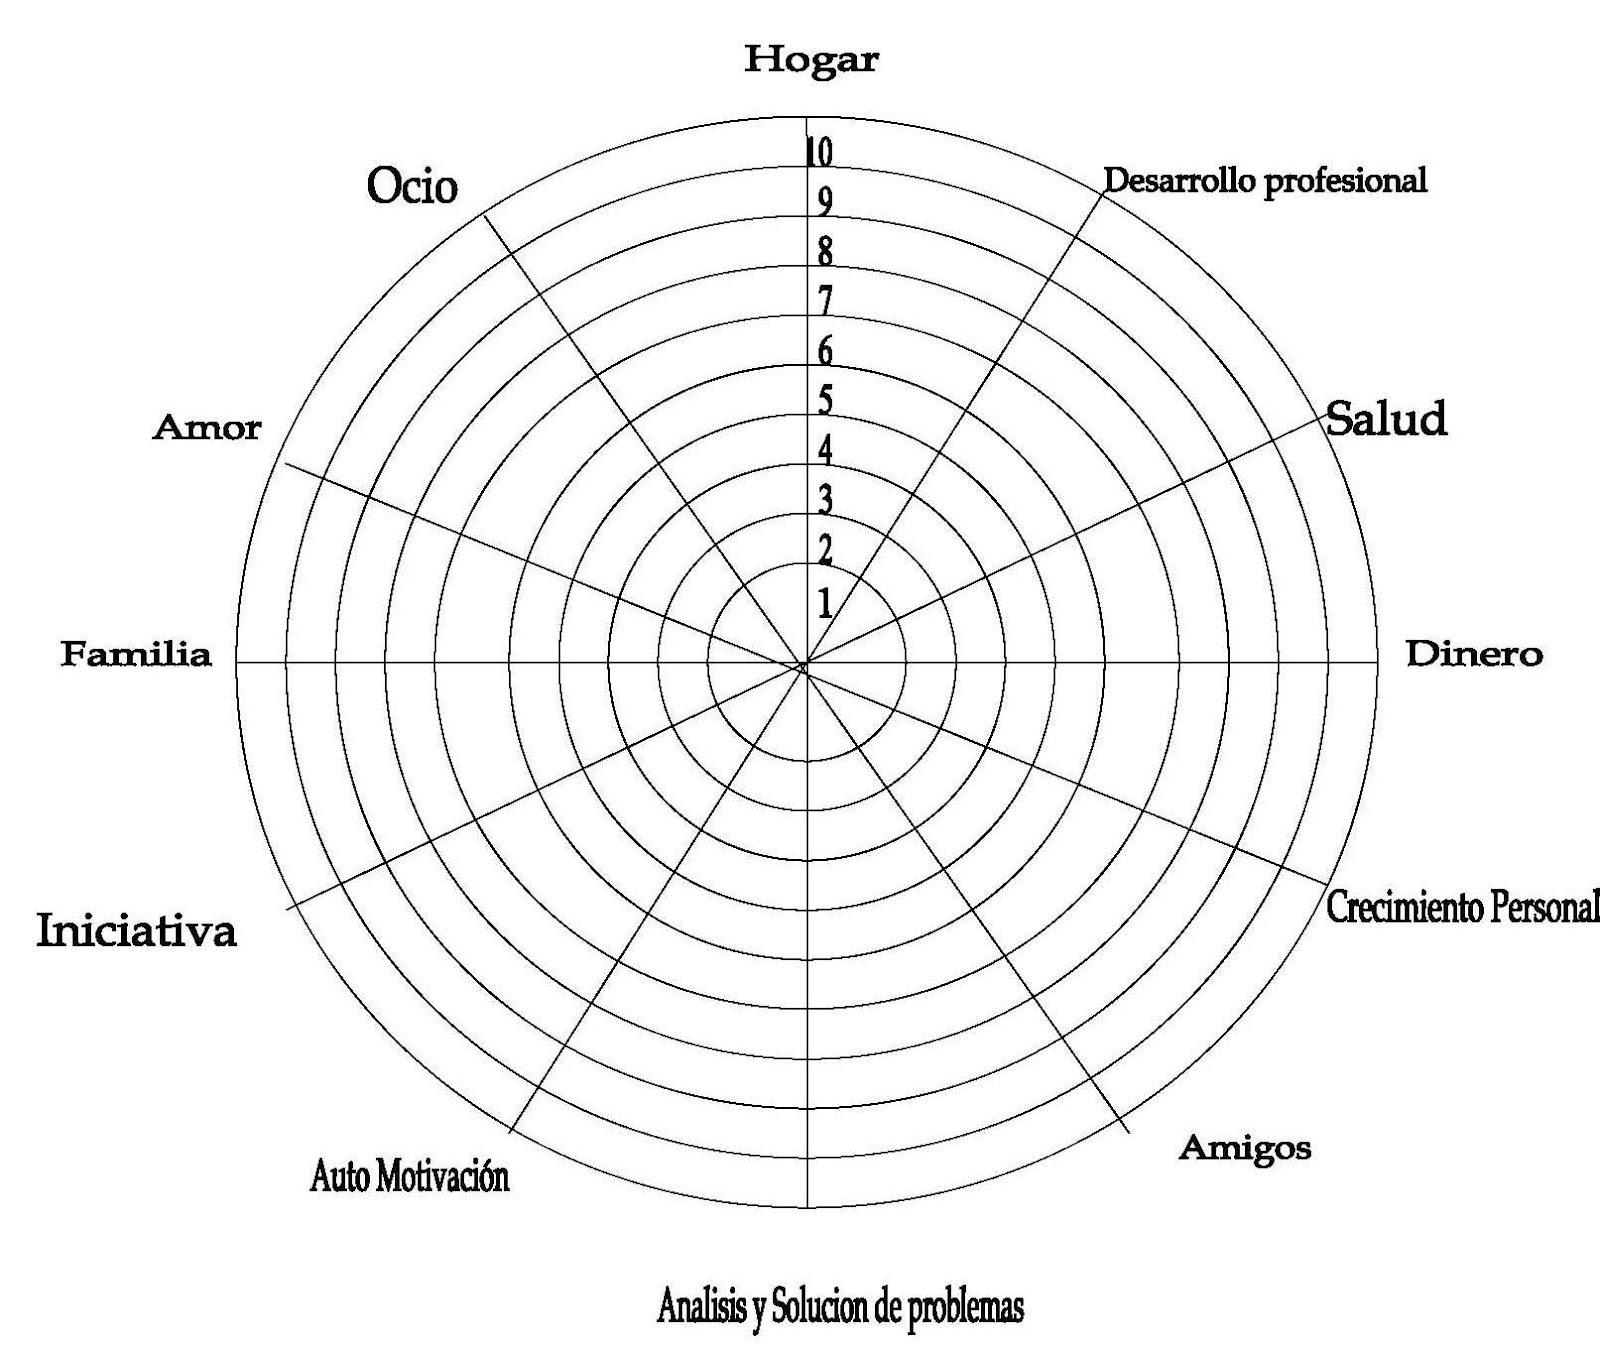 Herramienta de Coaching: La rueda de la vida